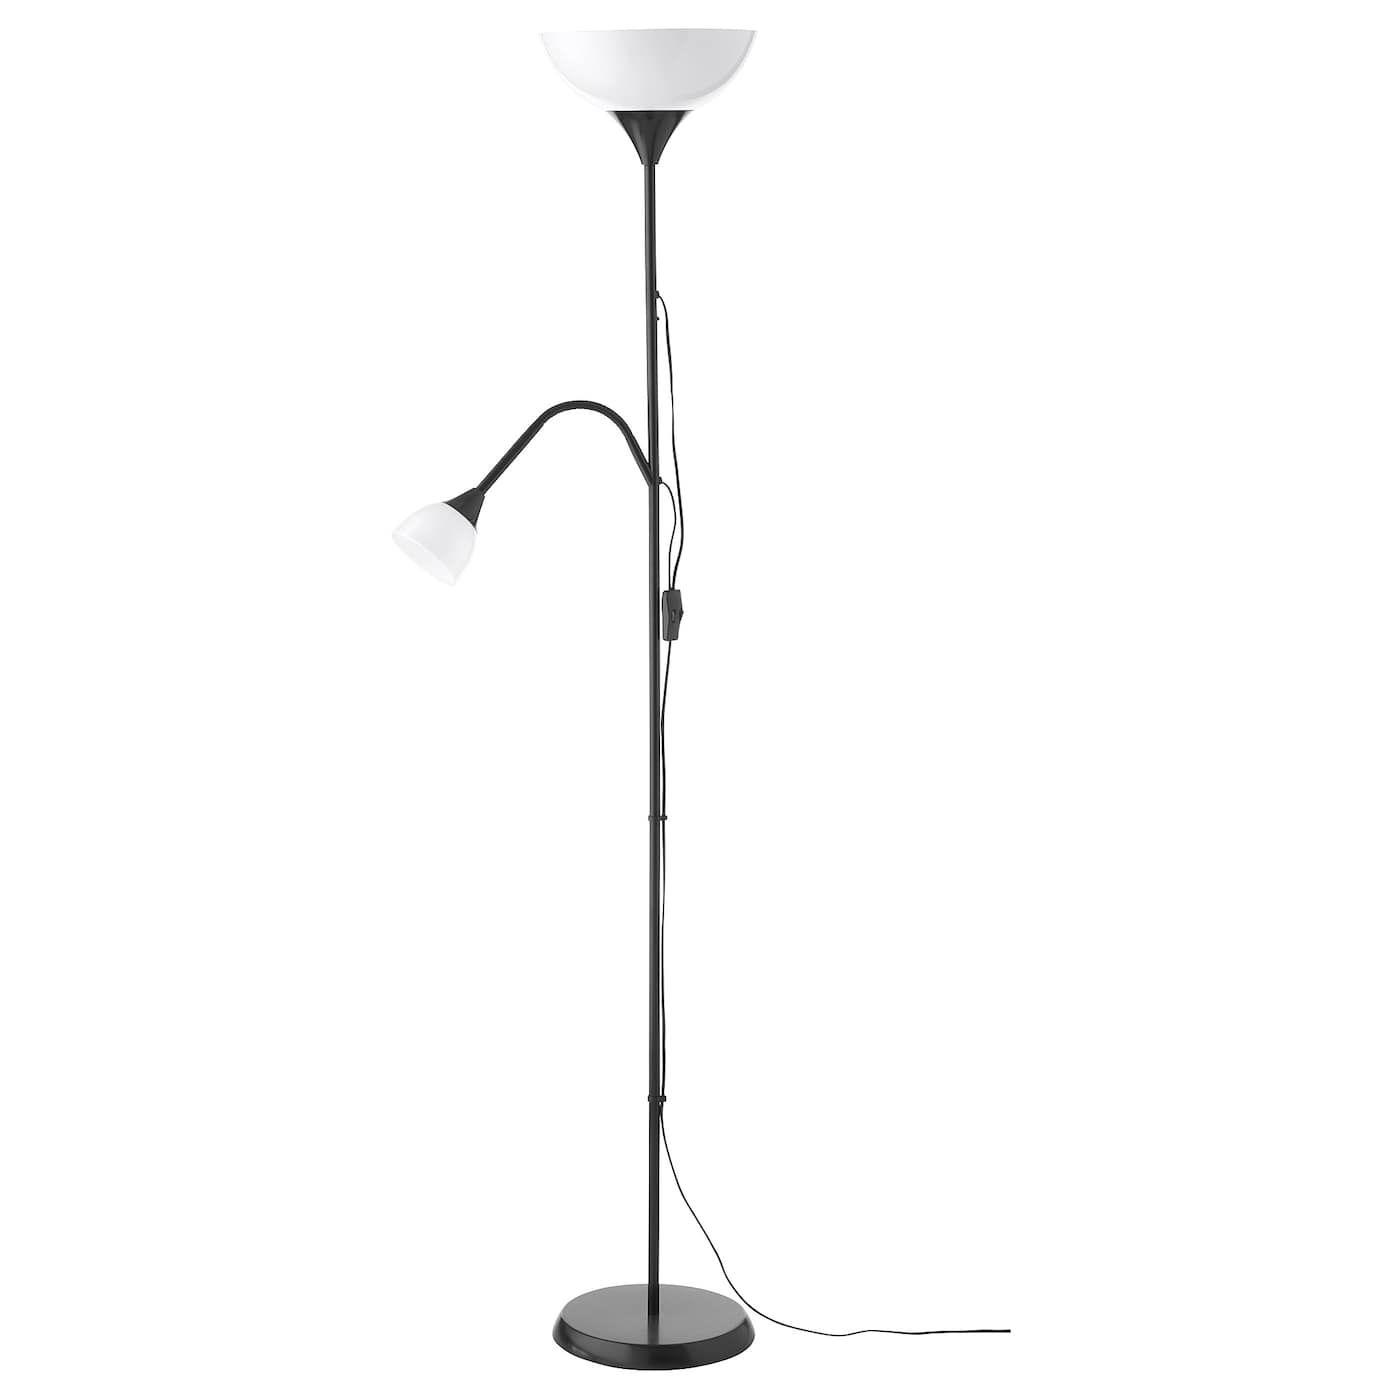 Not Deckenfluter Leseleuchte Schwarz Ikea Osterreich Black Lamps Lamp Reading Lamp